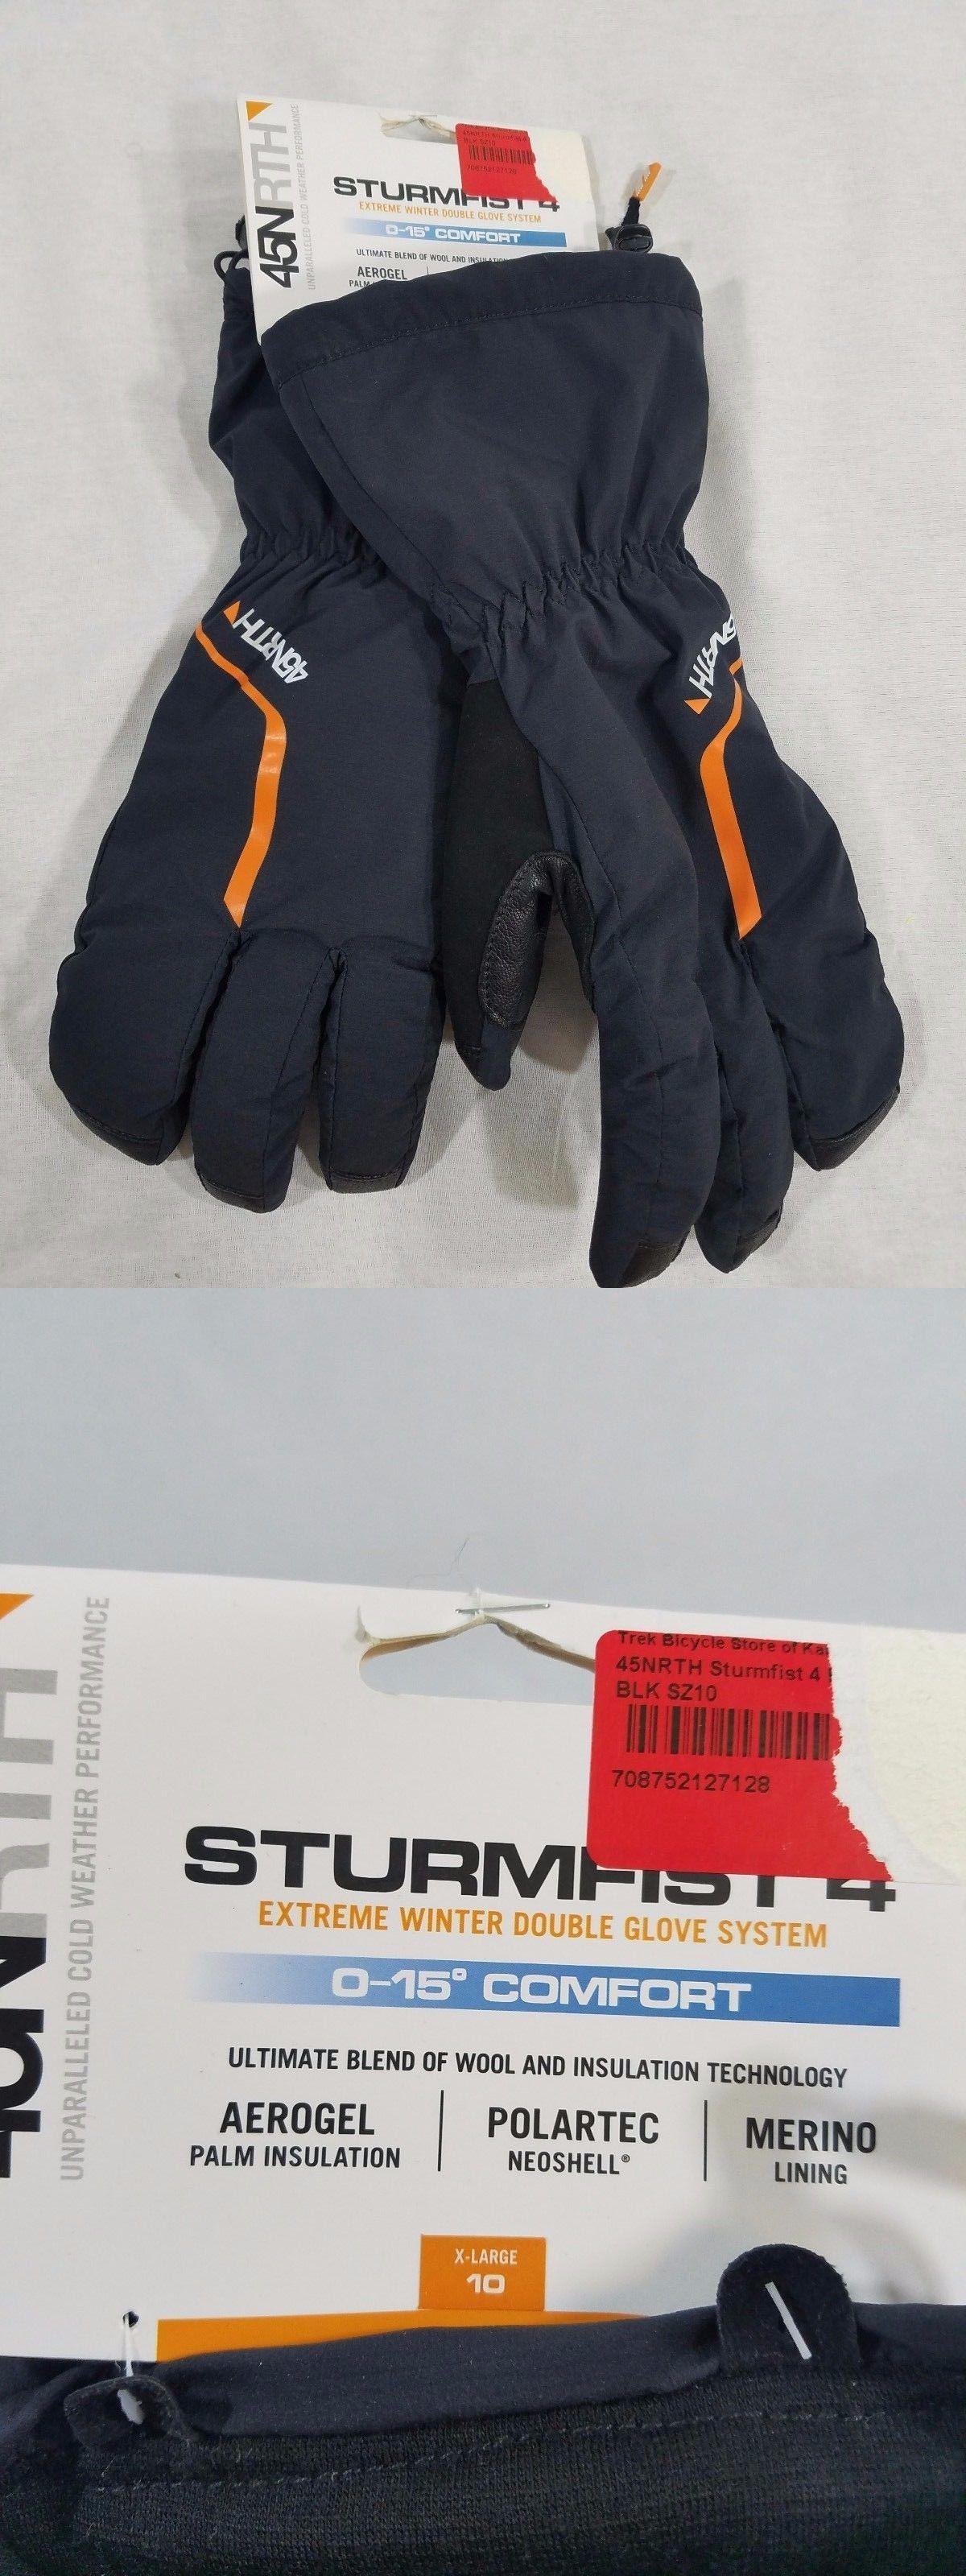 Gloves north sturmfist winter cycling gloves size x